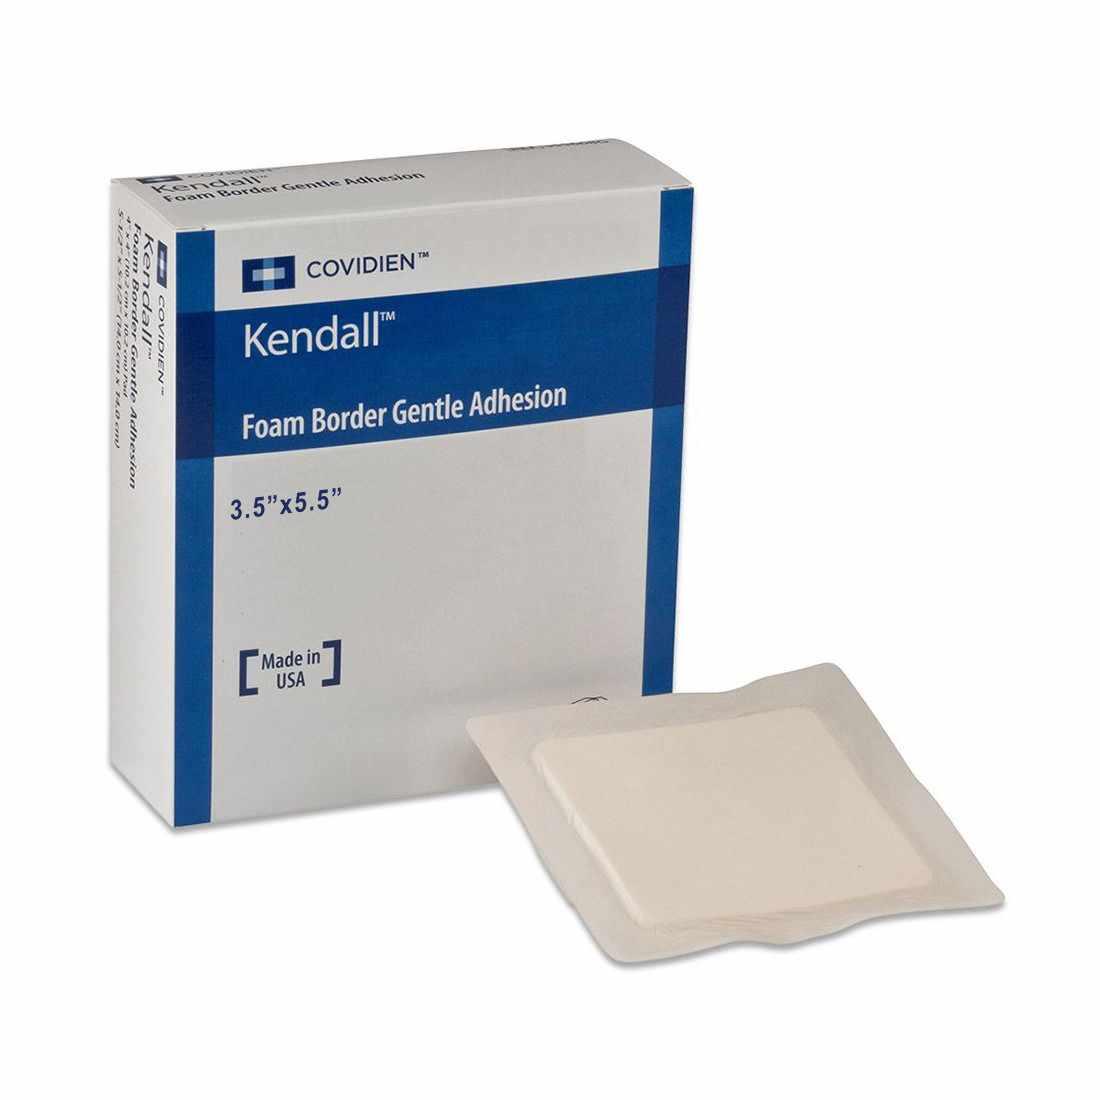 "Covidien border foam gentle adhesion dressing 3.5"" x 3.5"" pad size 2"" x 2"""